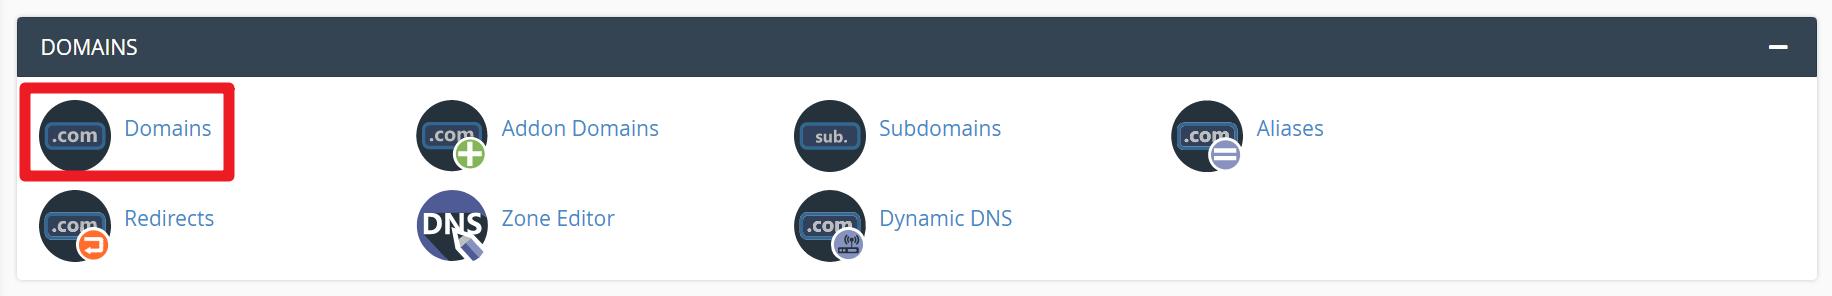 add domain in hostarmada - Hostarmada主机:优惠购买攻略、建站教程与速度评测